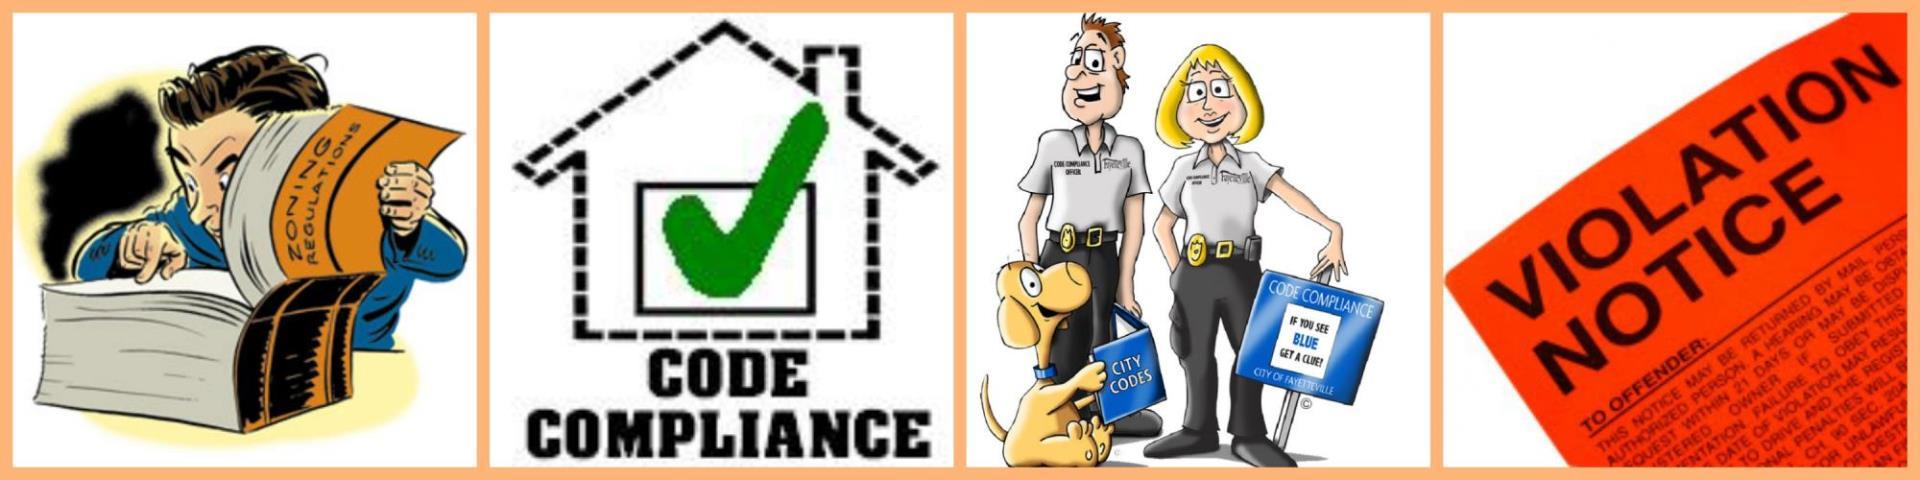 City of Punta Gorda, FL : Code Compliance Permits.